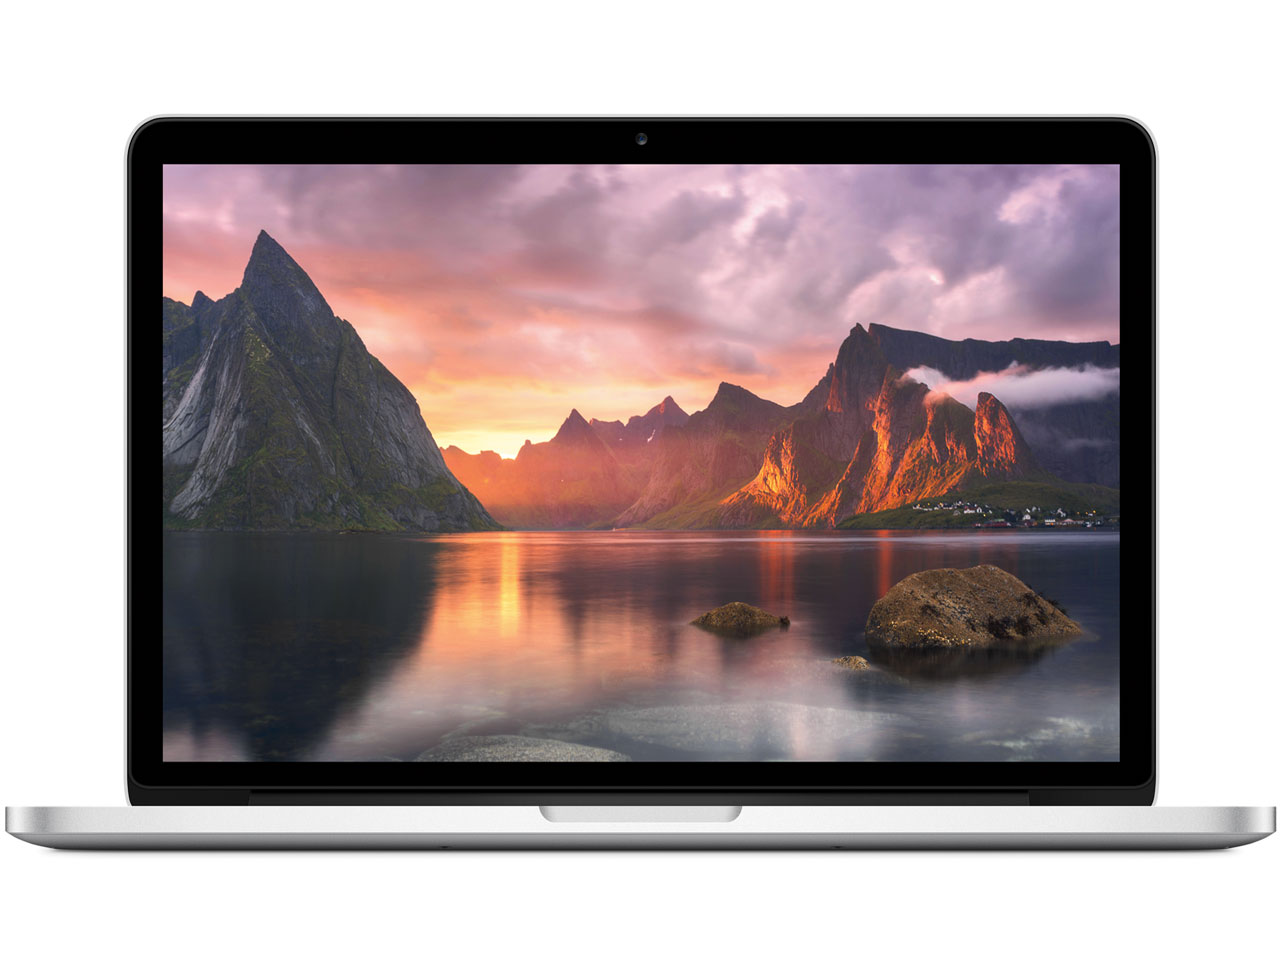 MacBook Pro Retinaディスプレイ 2700/13.3 MF840J/A の製品画像